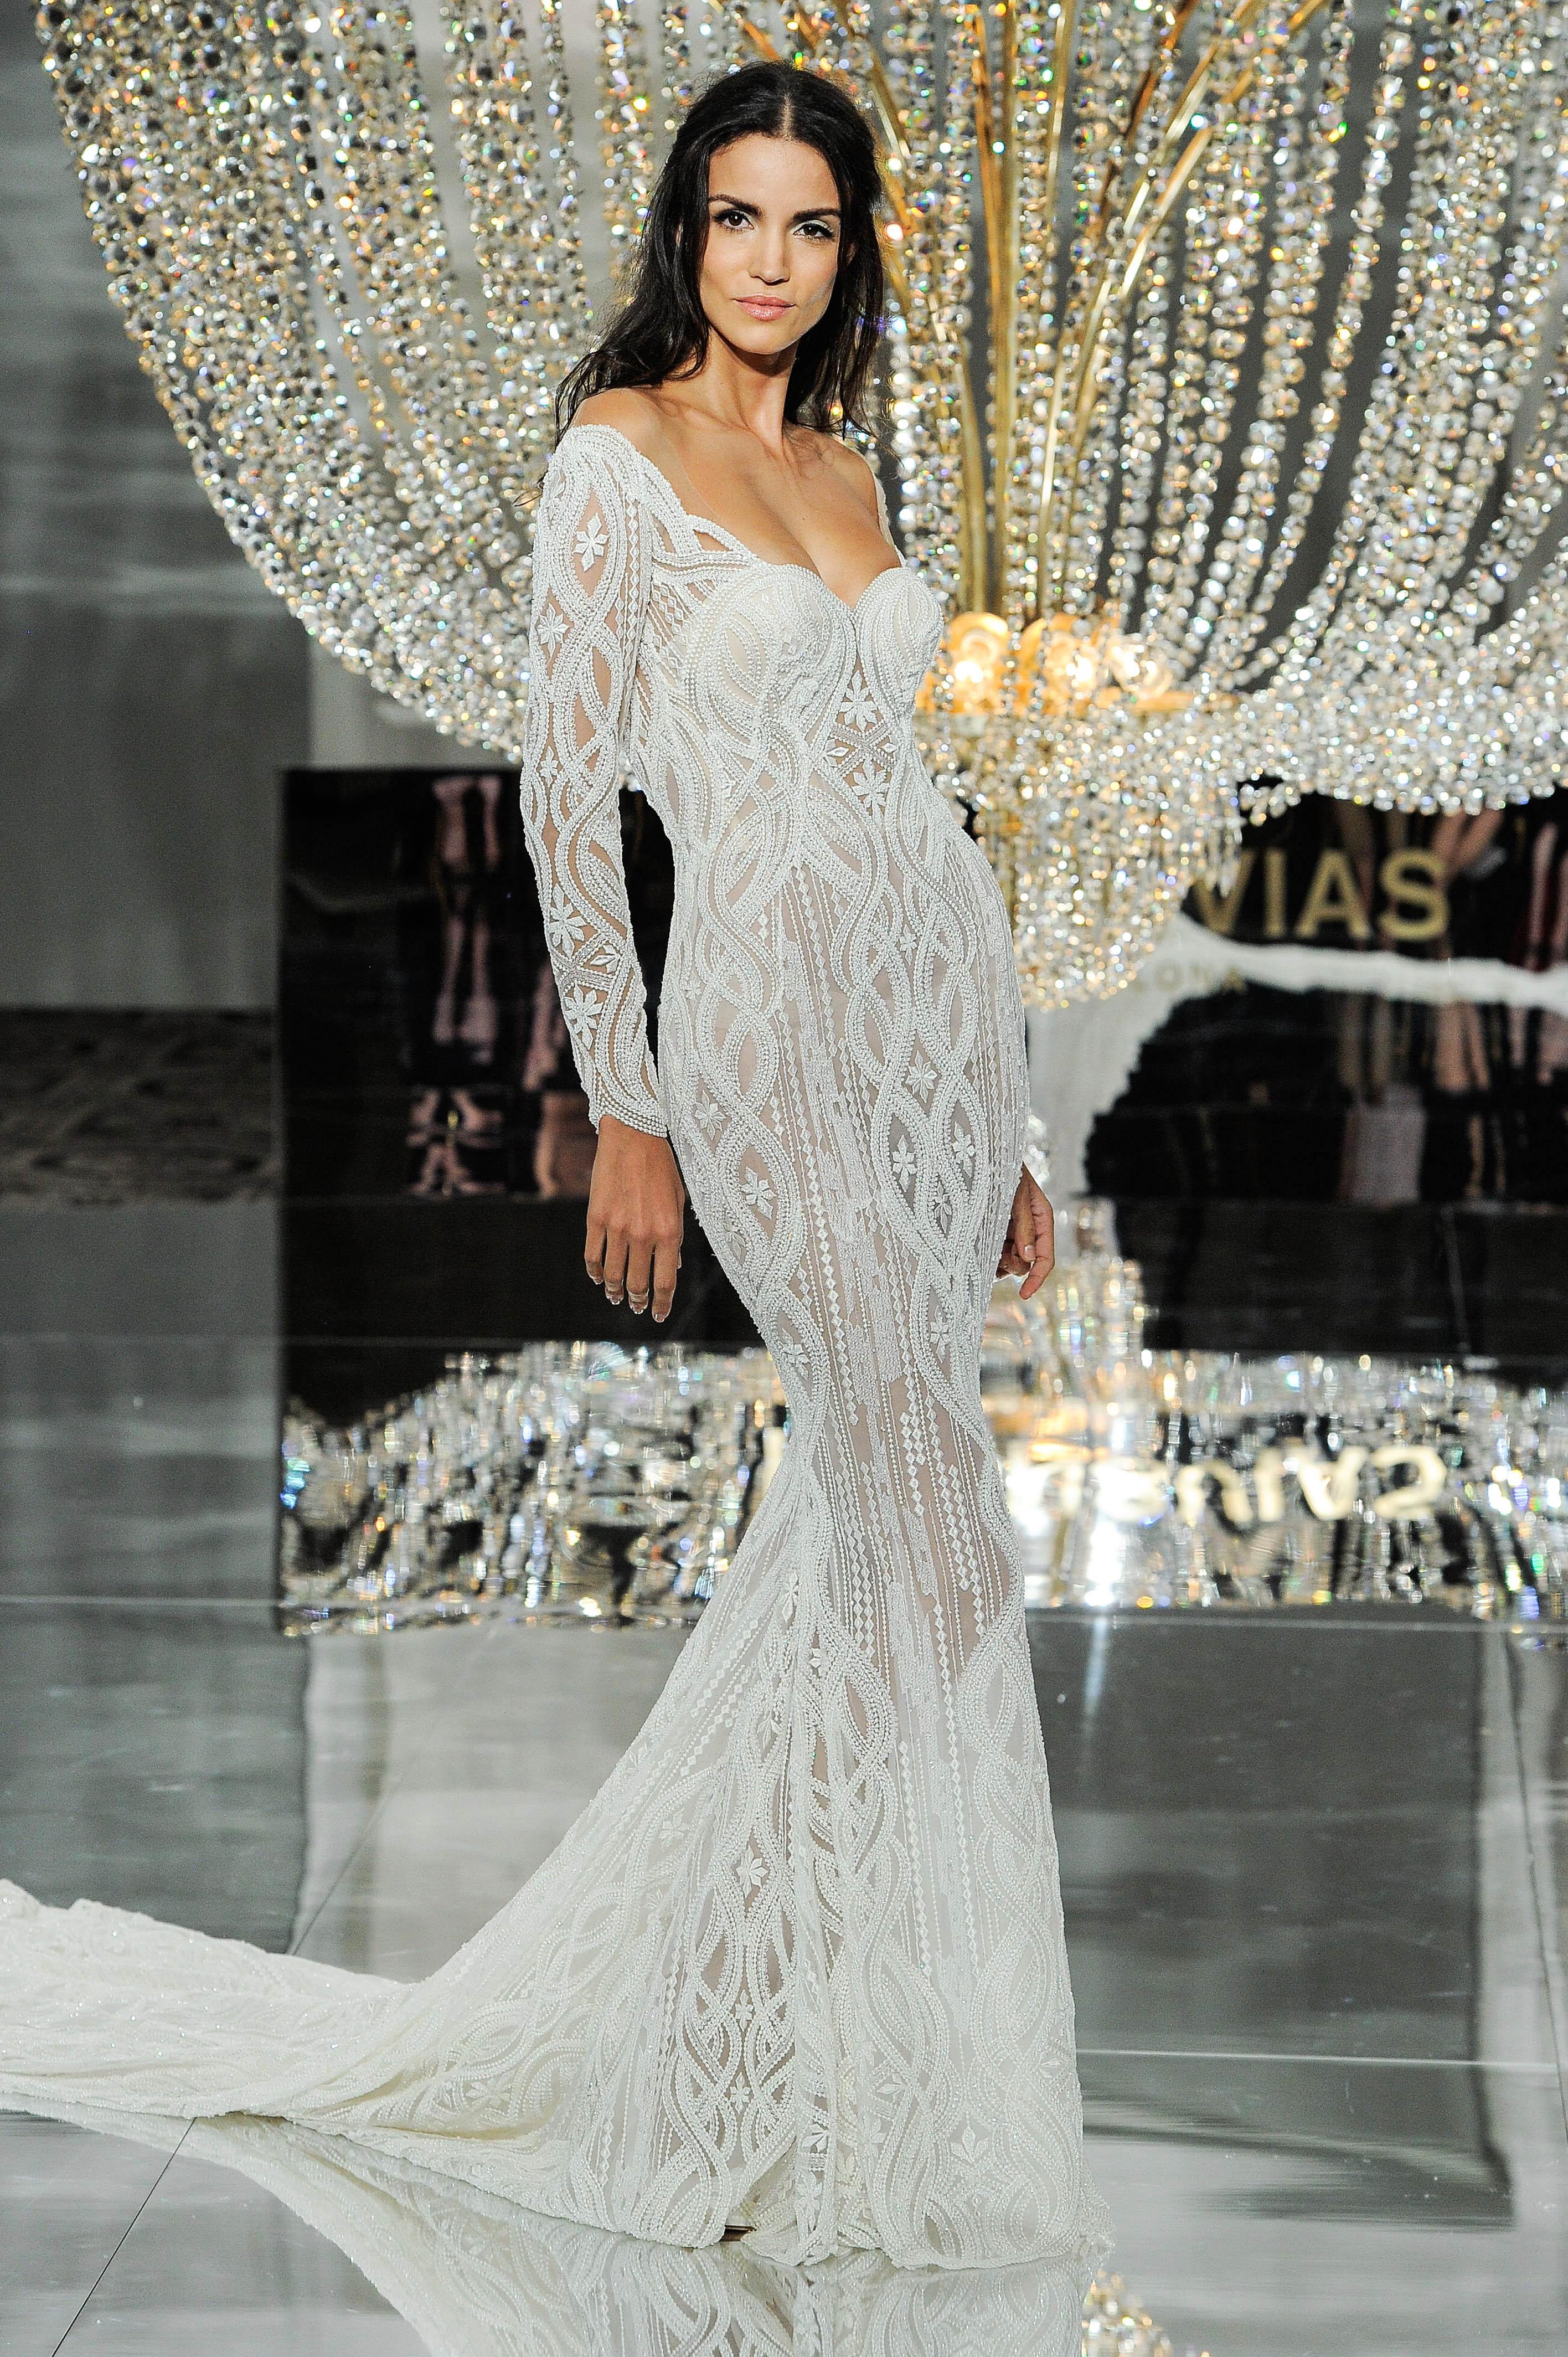 pronovias wedding dress fall 2018 trumpet long sleeves off the shoulder